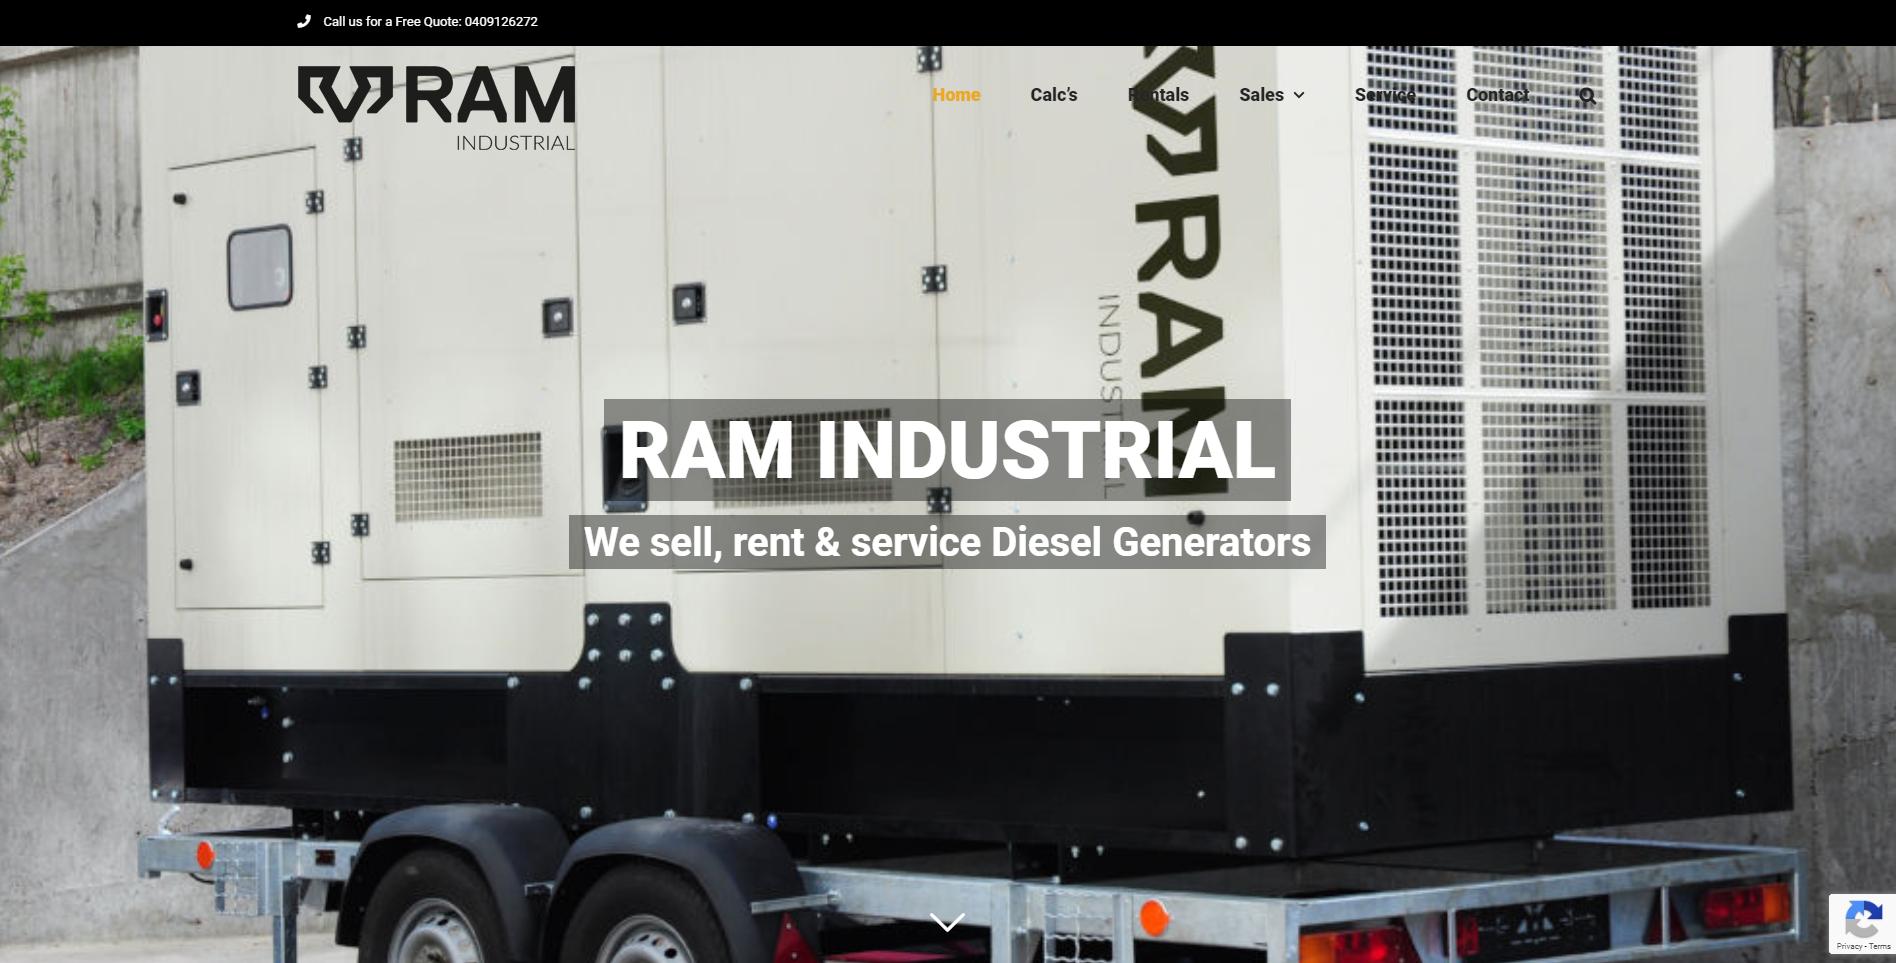 RAM Industrial